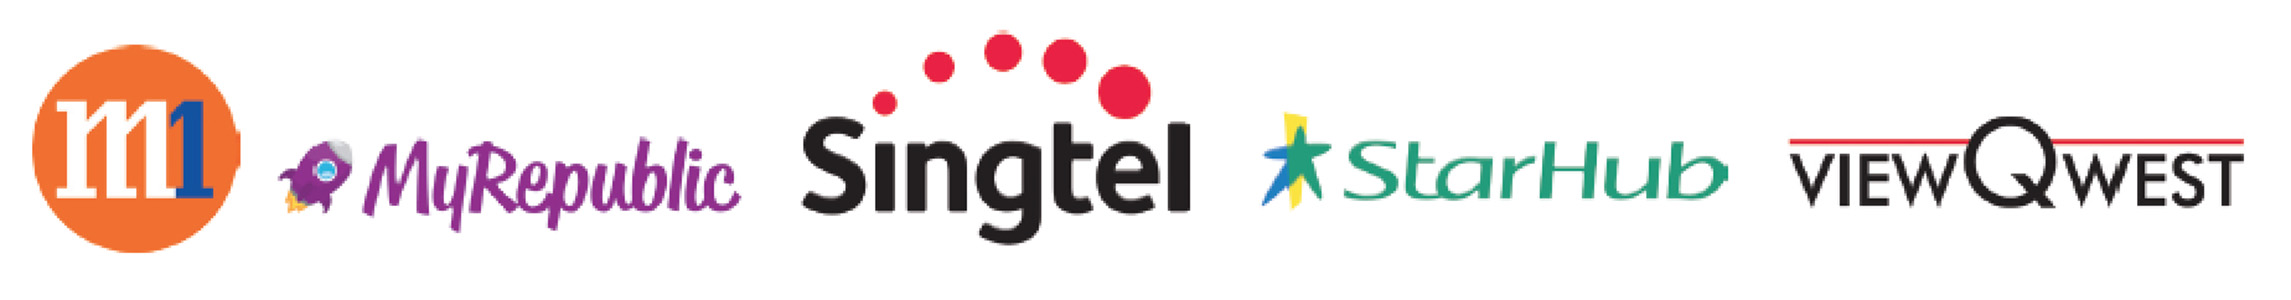 Telco Logos Singapore